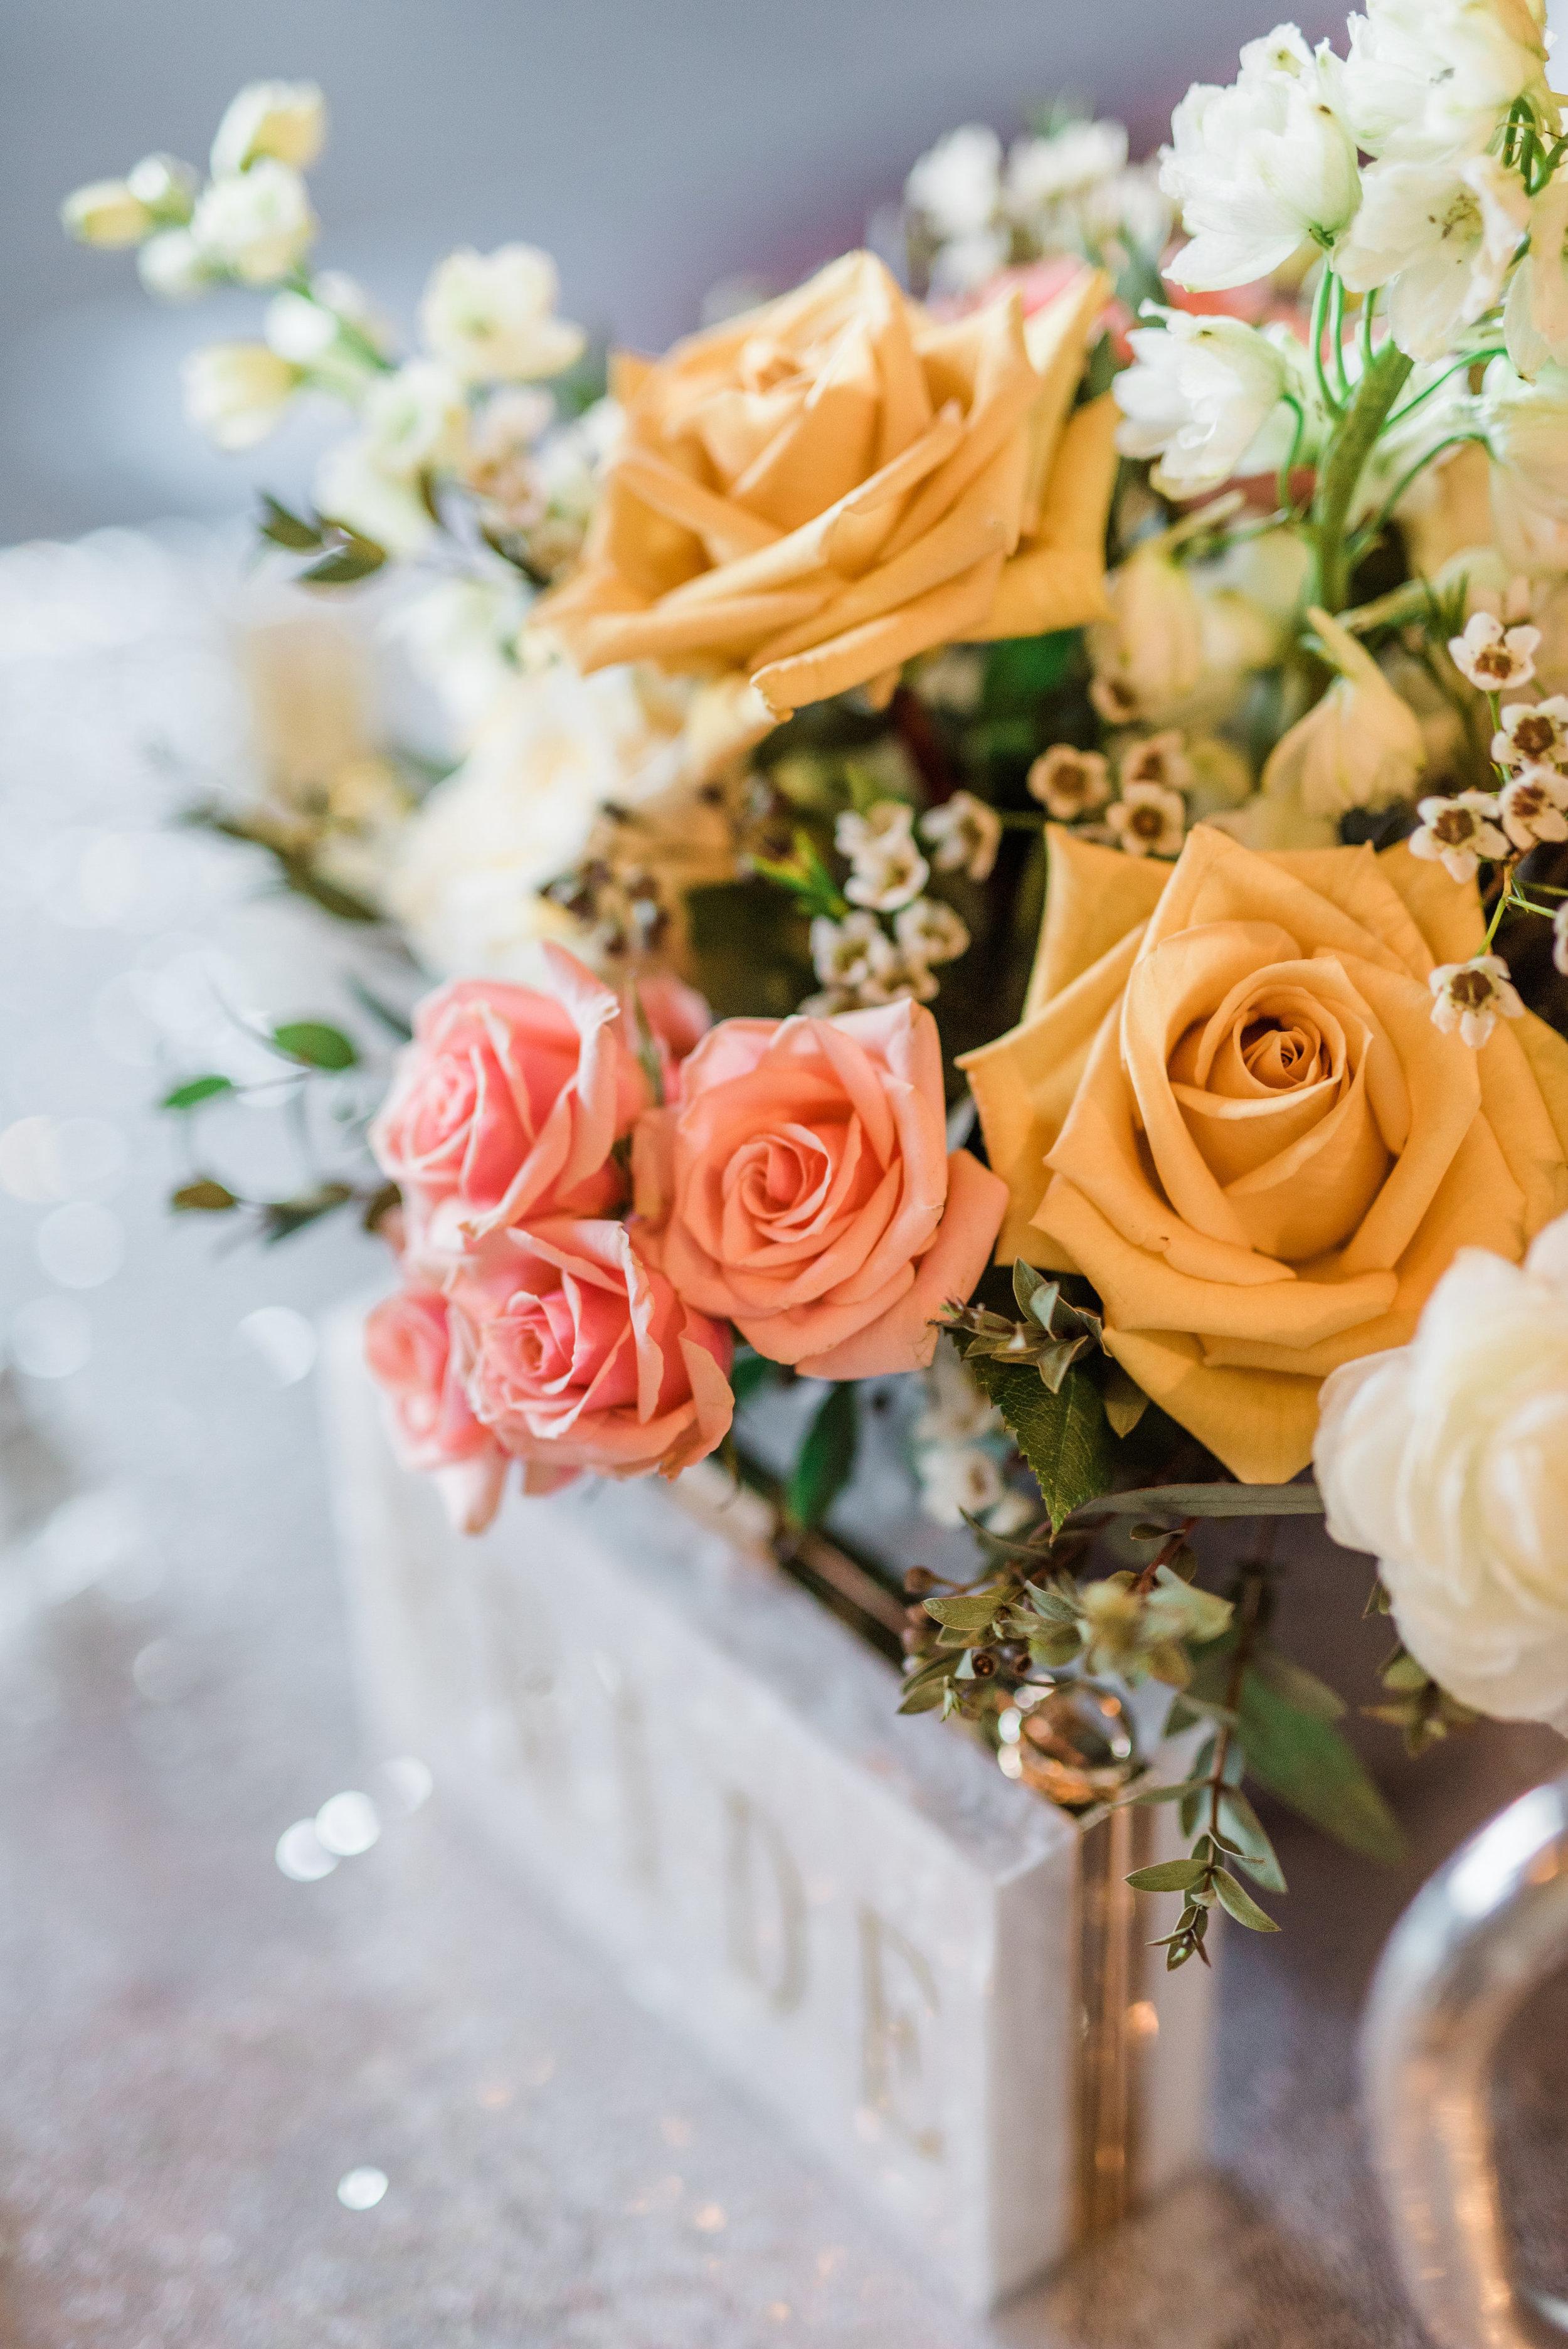 Boho Sedona Wedding - Centerpiece with gold and white flowers